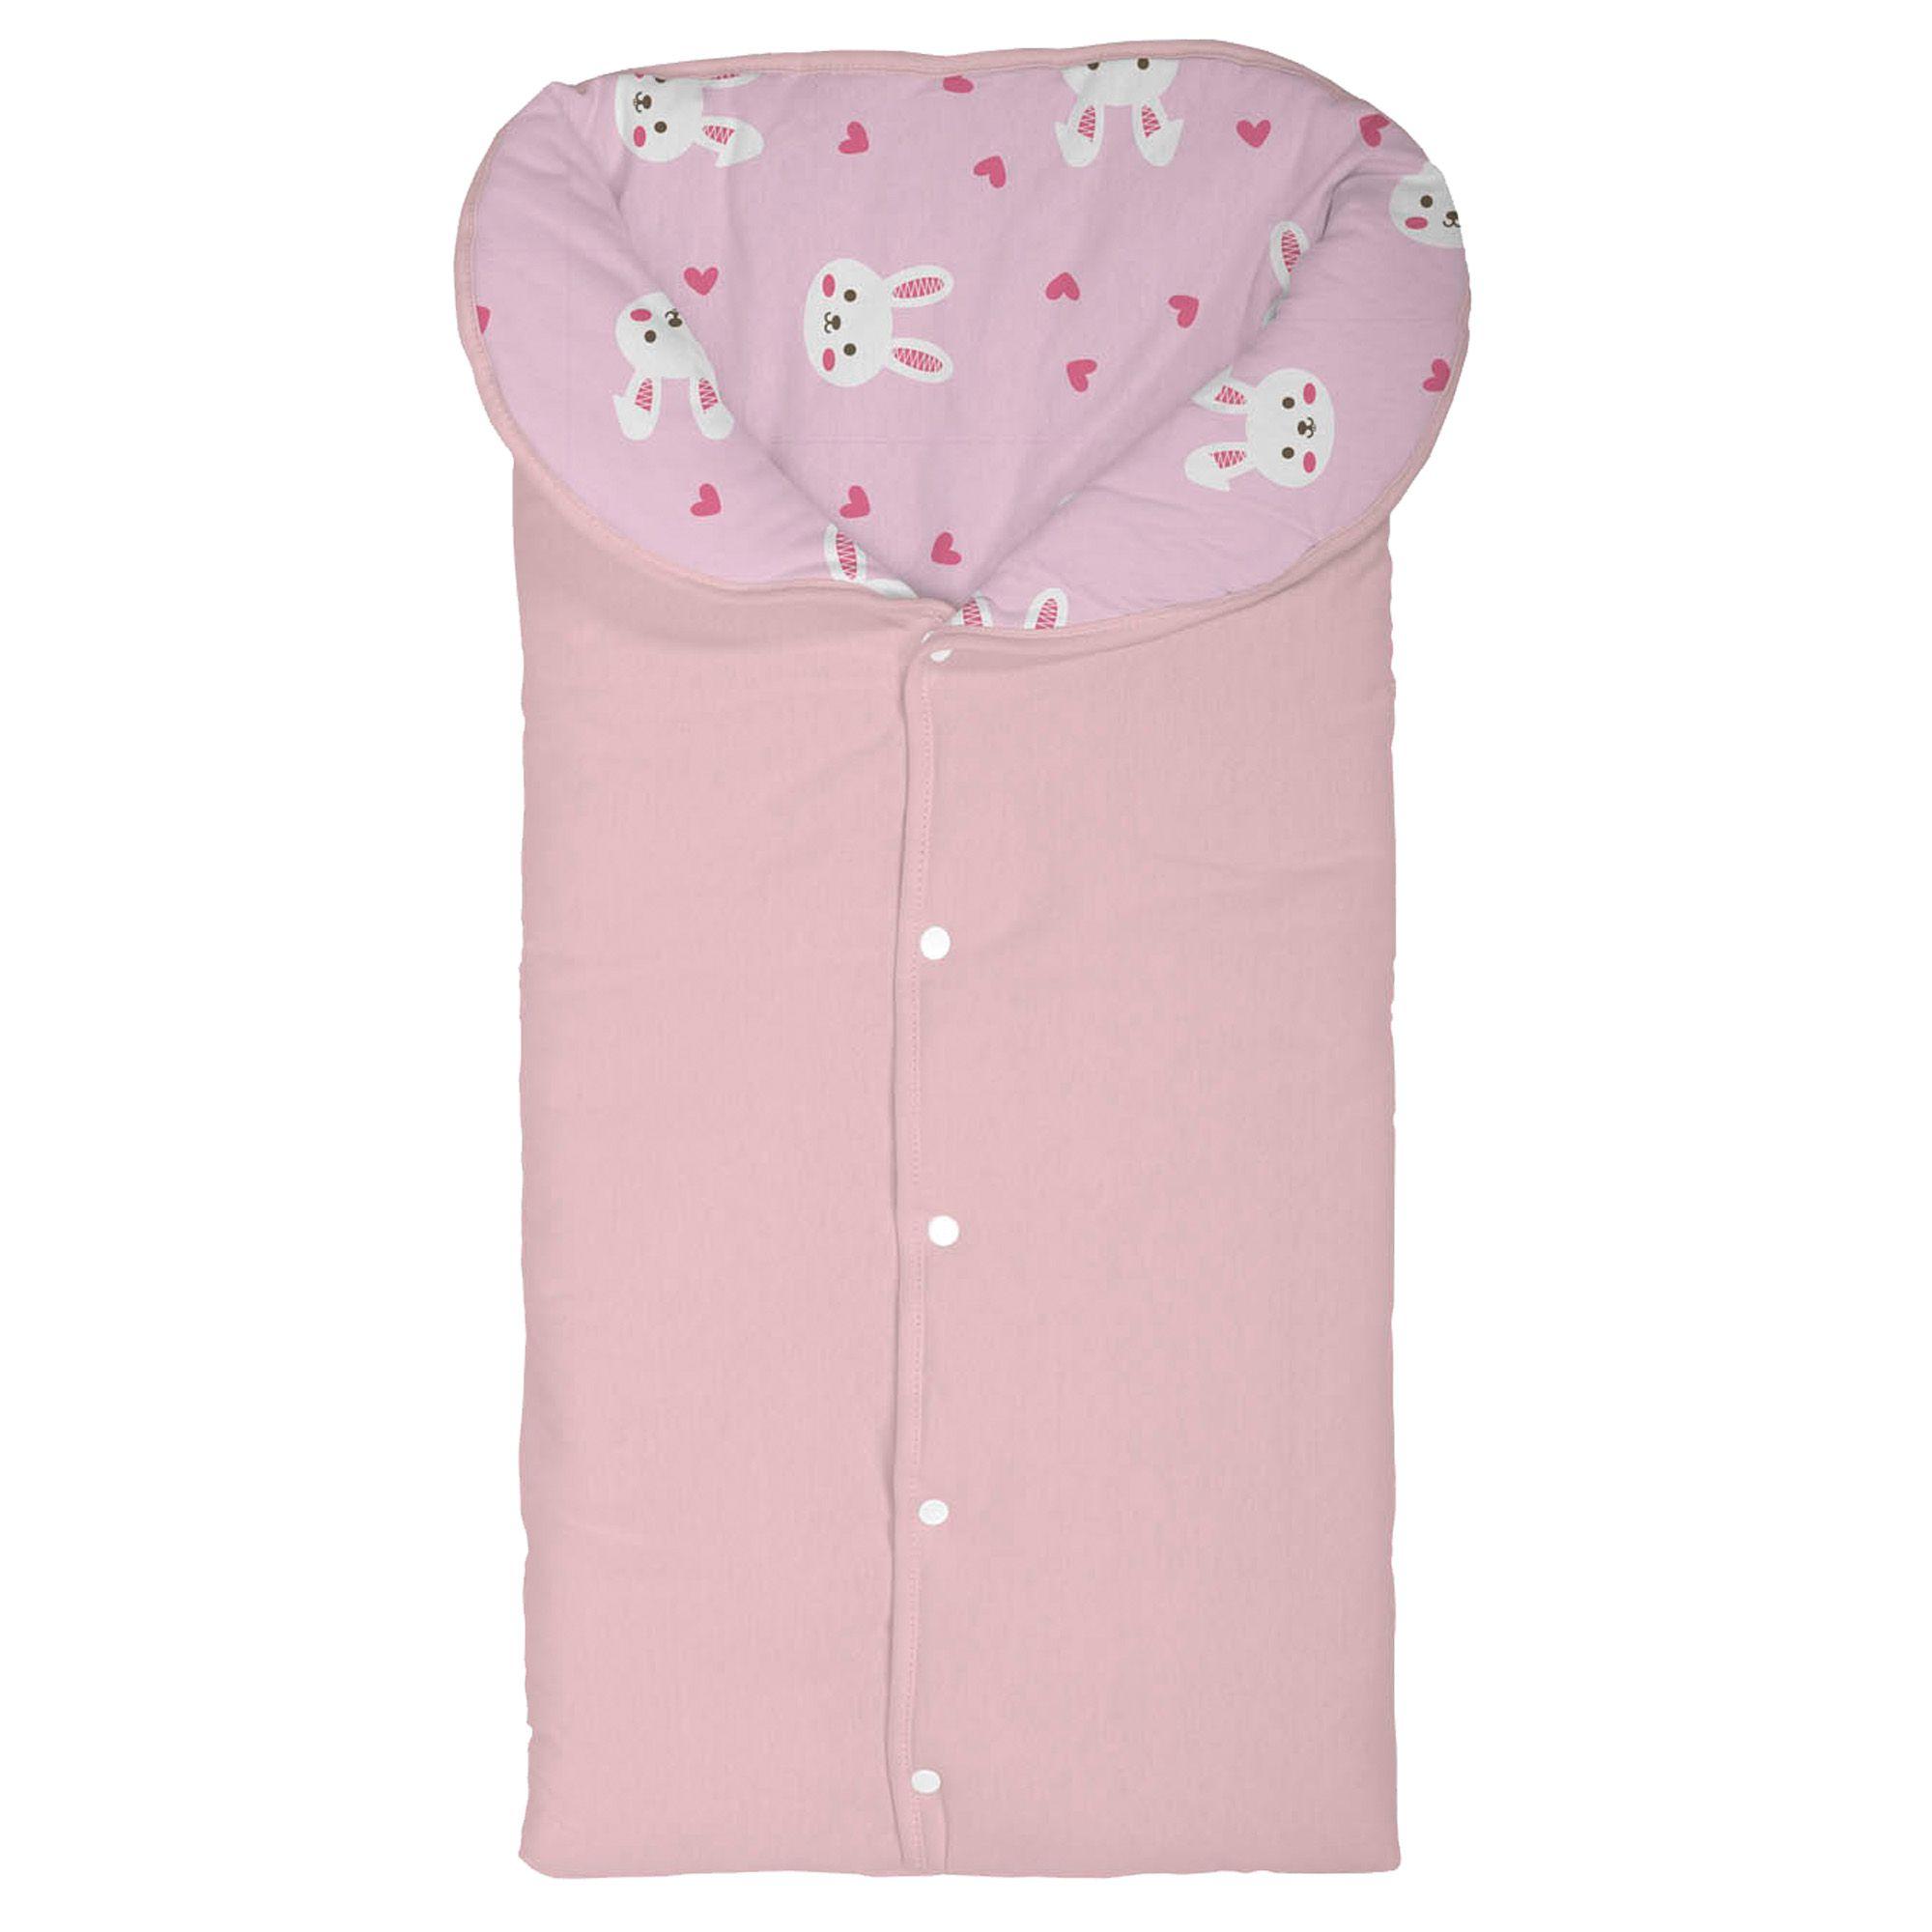 Porta Bebê Incomfral Bambi - Estampado Coelha - Rosa Claro